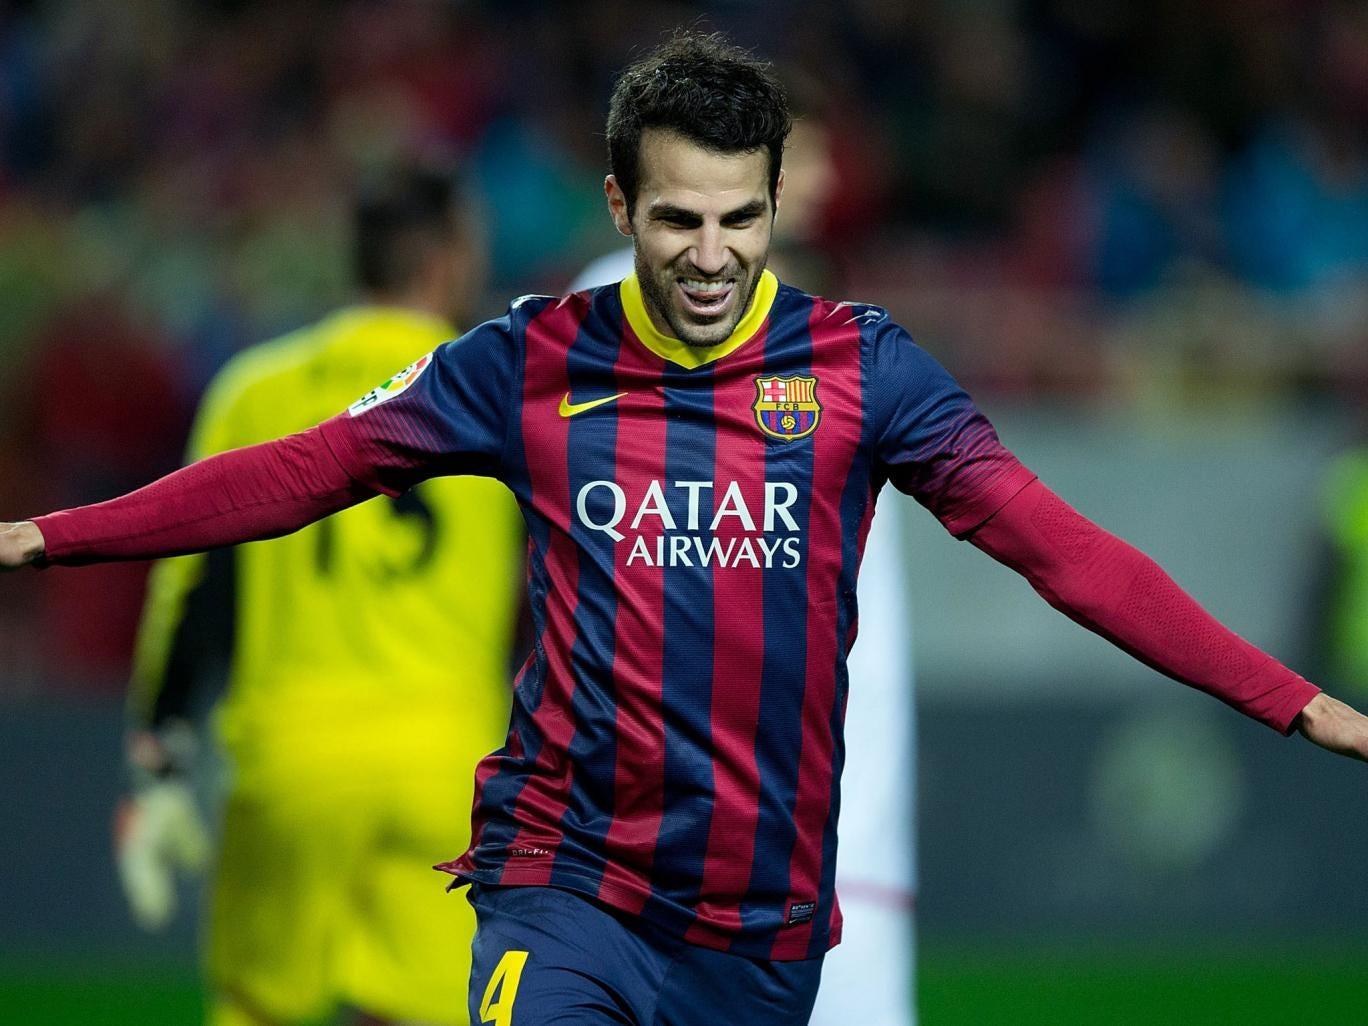 Cesc Fabregas celebrates his goal for Barcelona against Seville last weekend